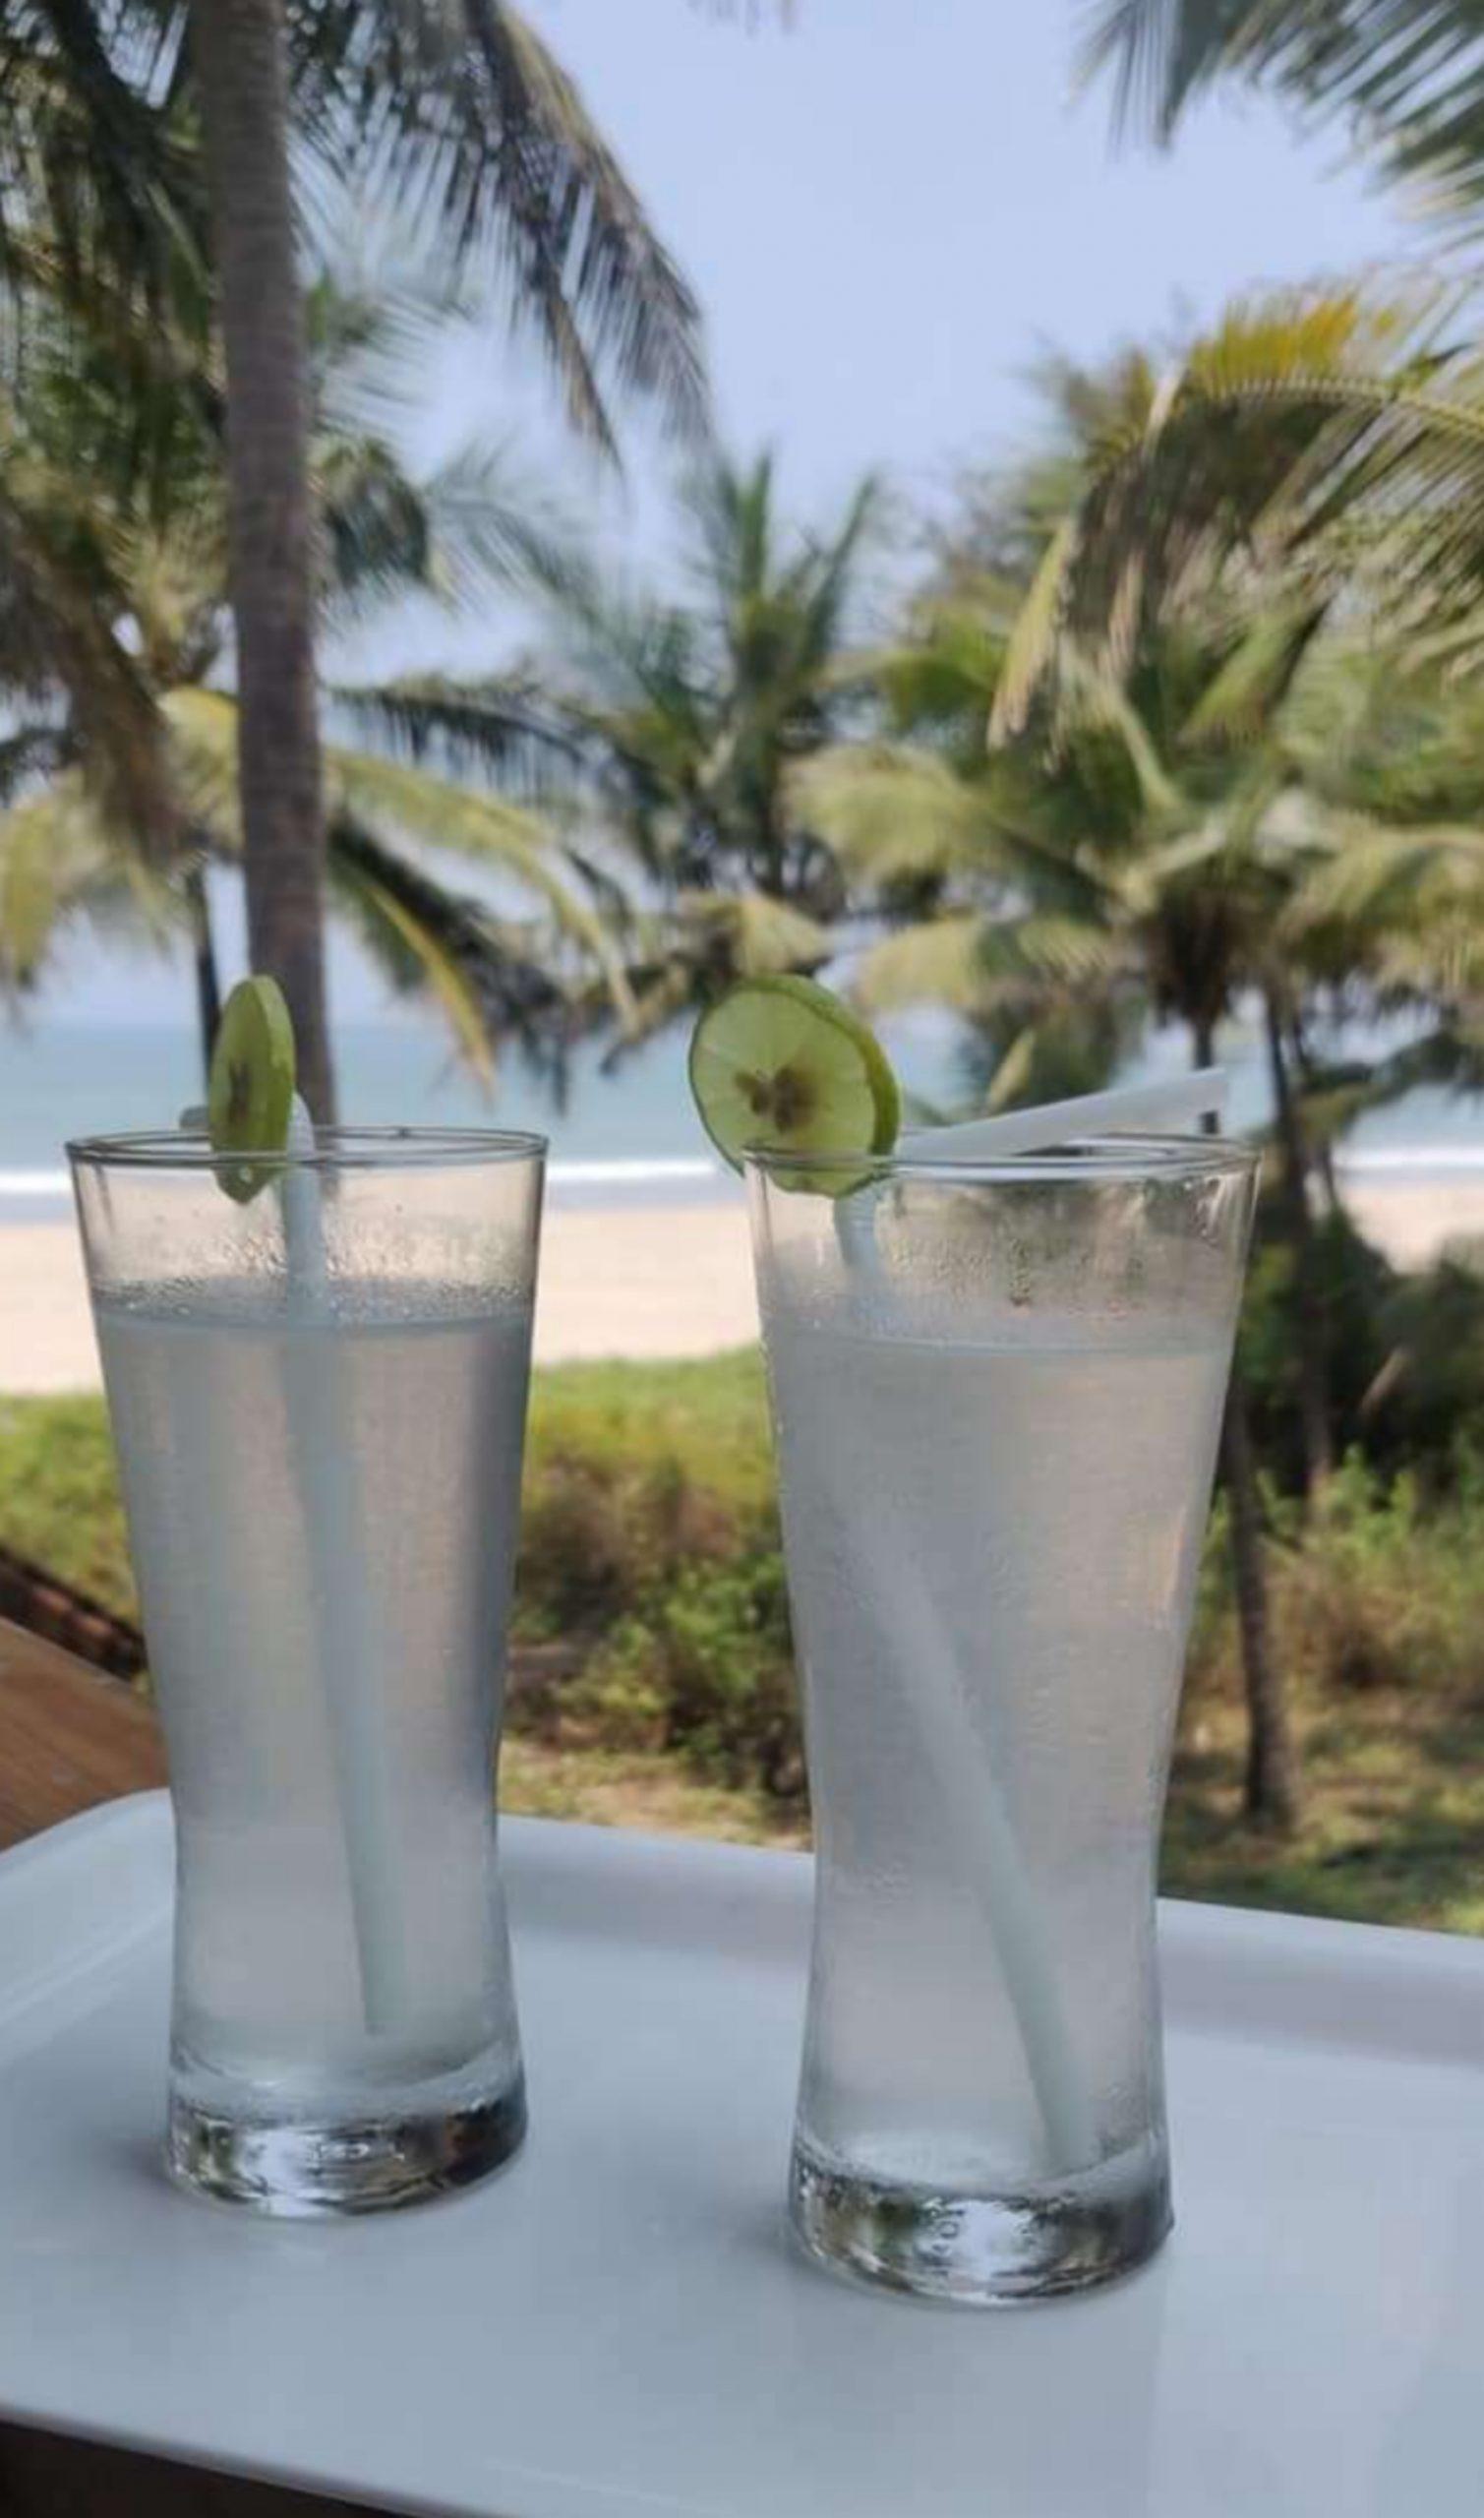 Lemon juice glasses